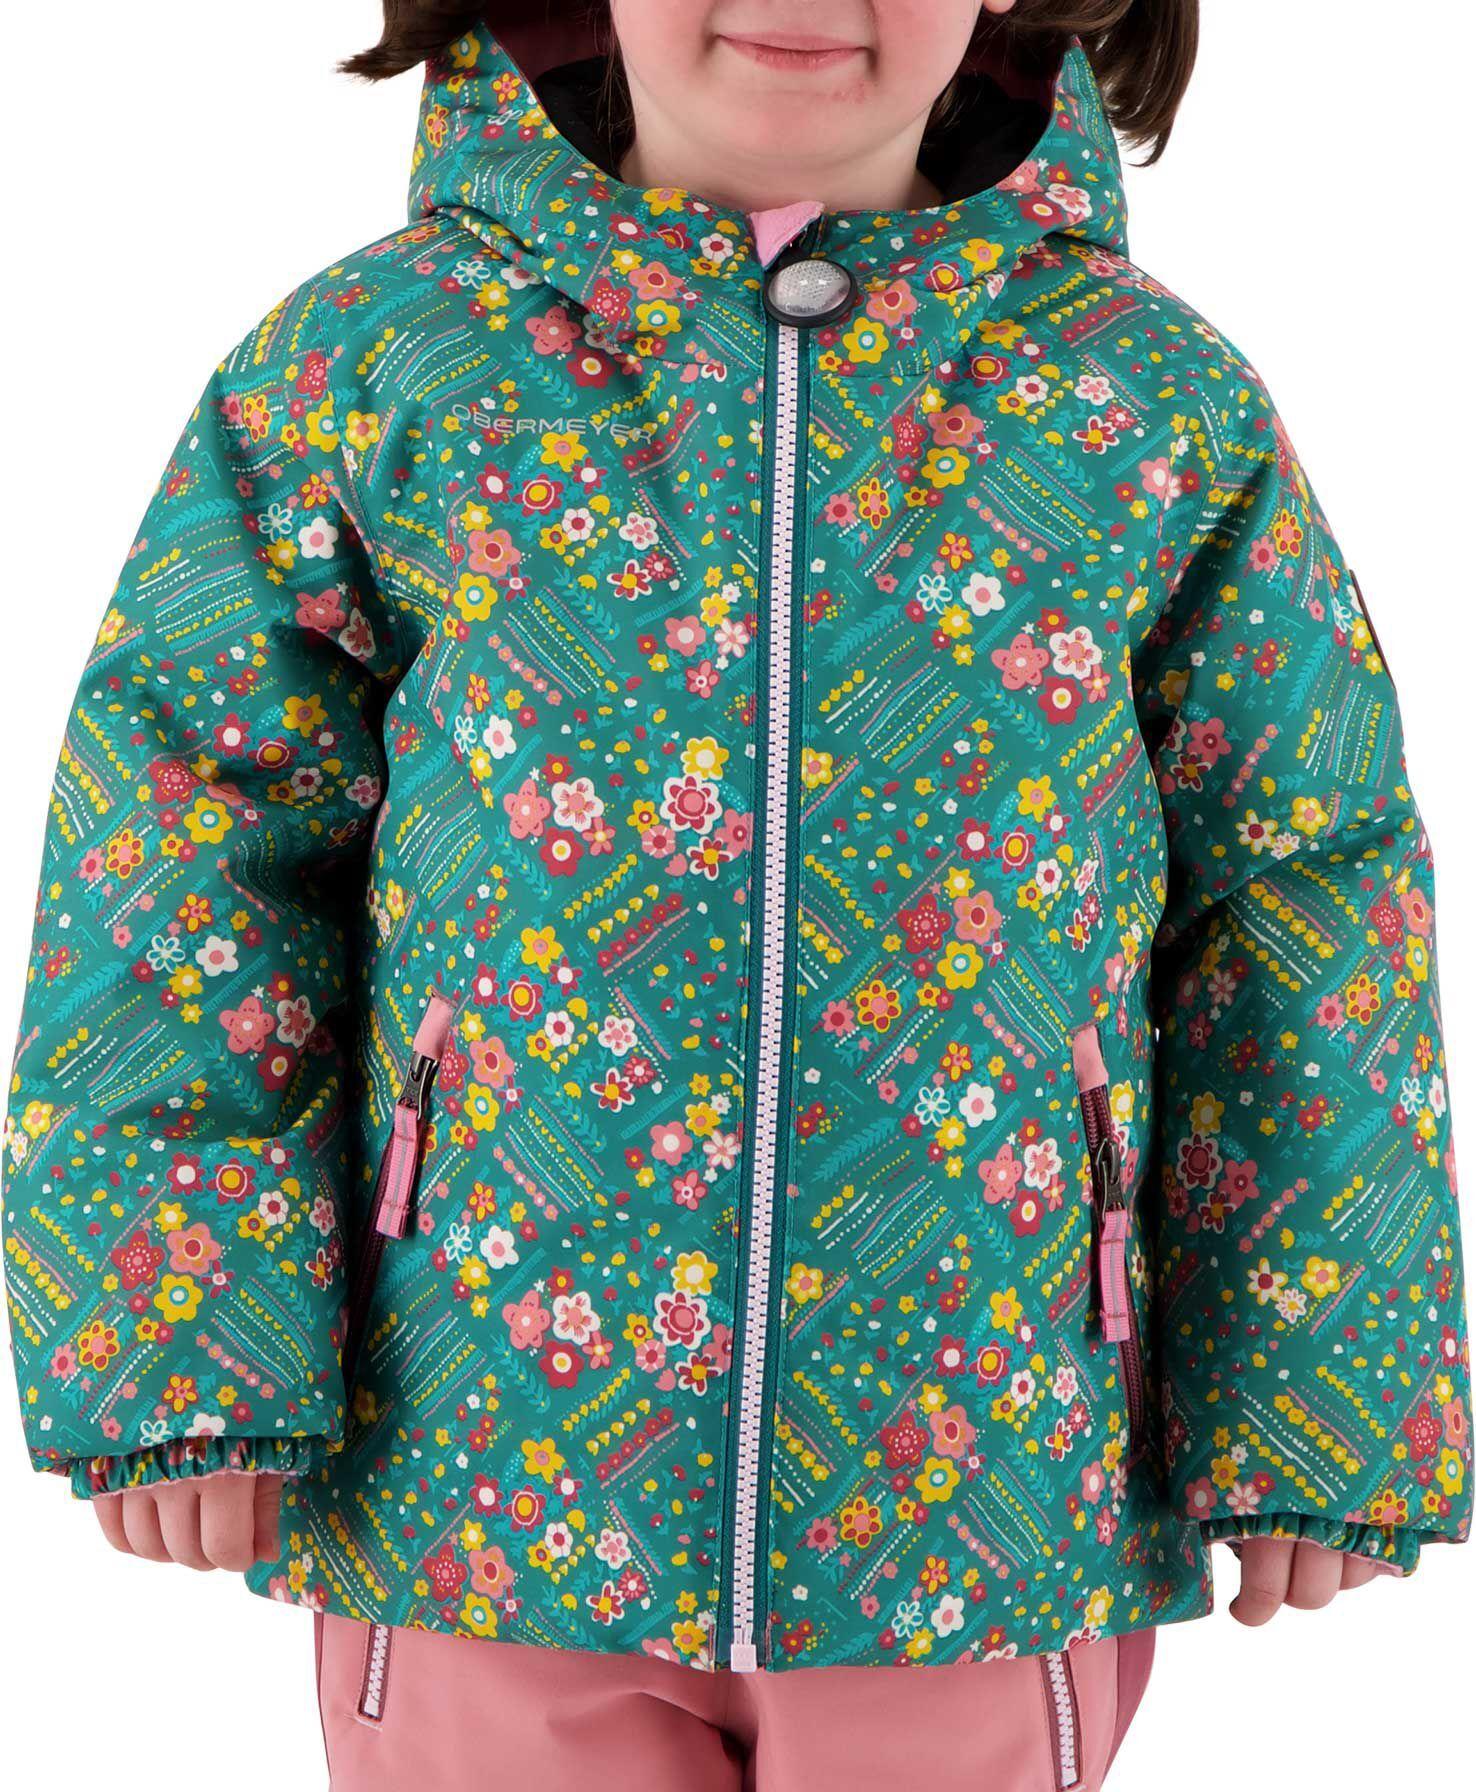 Obermeyer Youth Ash Winter Jacket, Girls', Size 5, Garden Patch